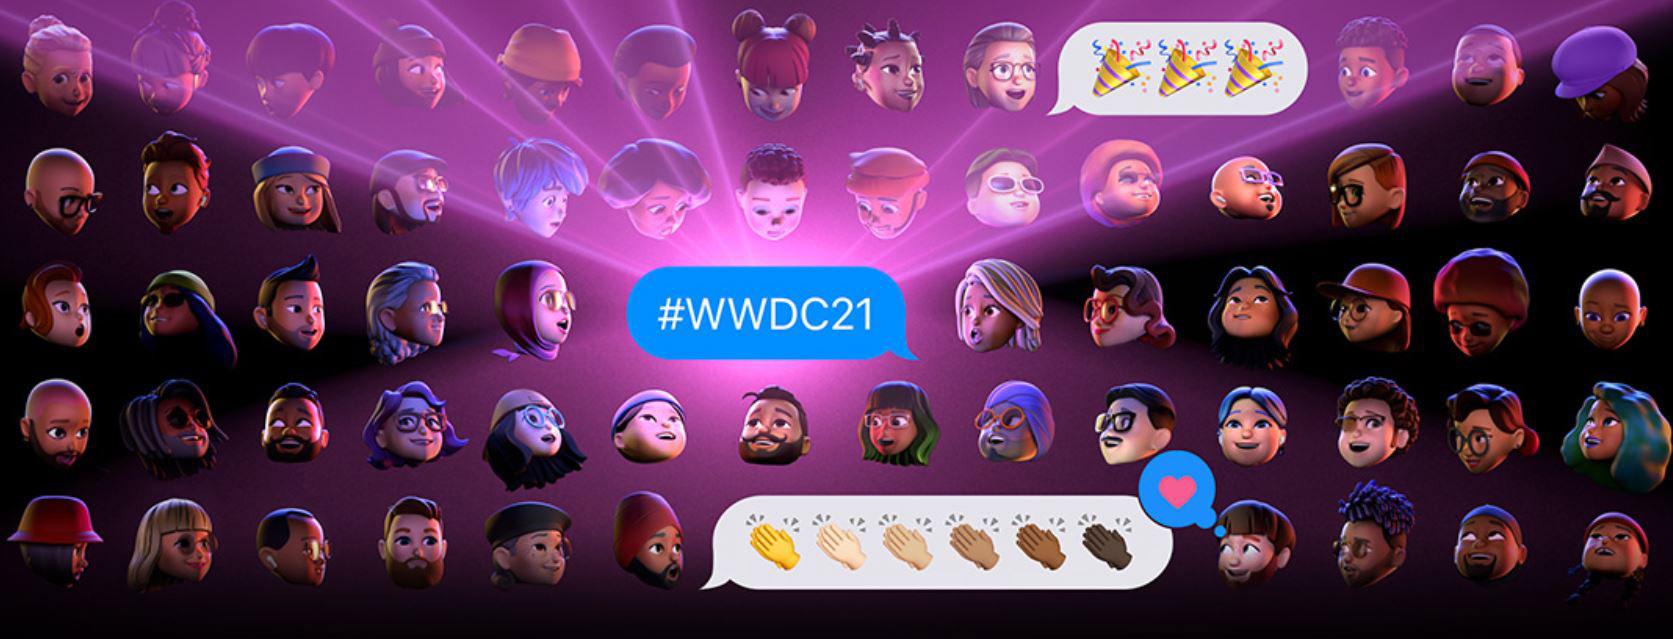 مراسم WWDC 2021 اپل